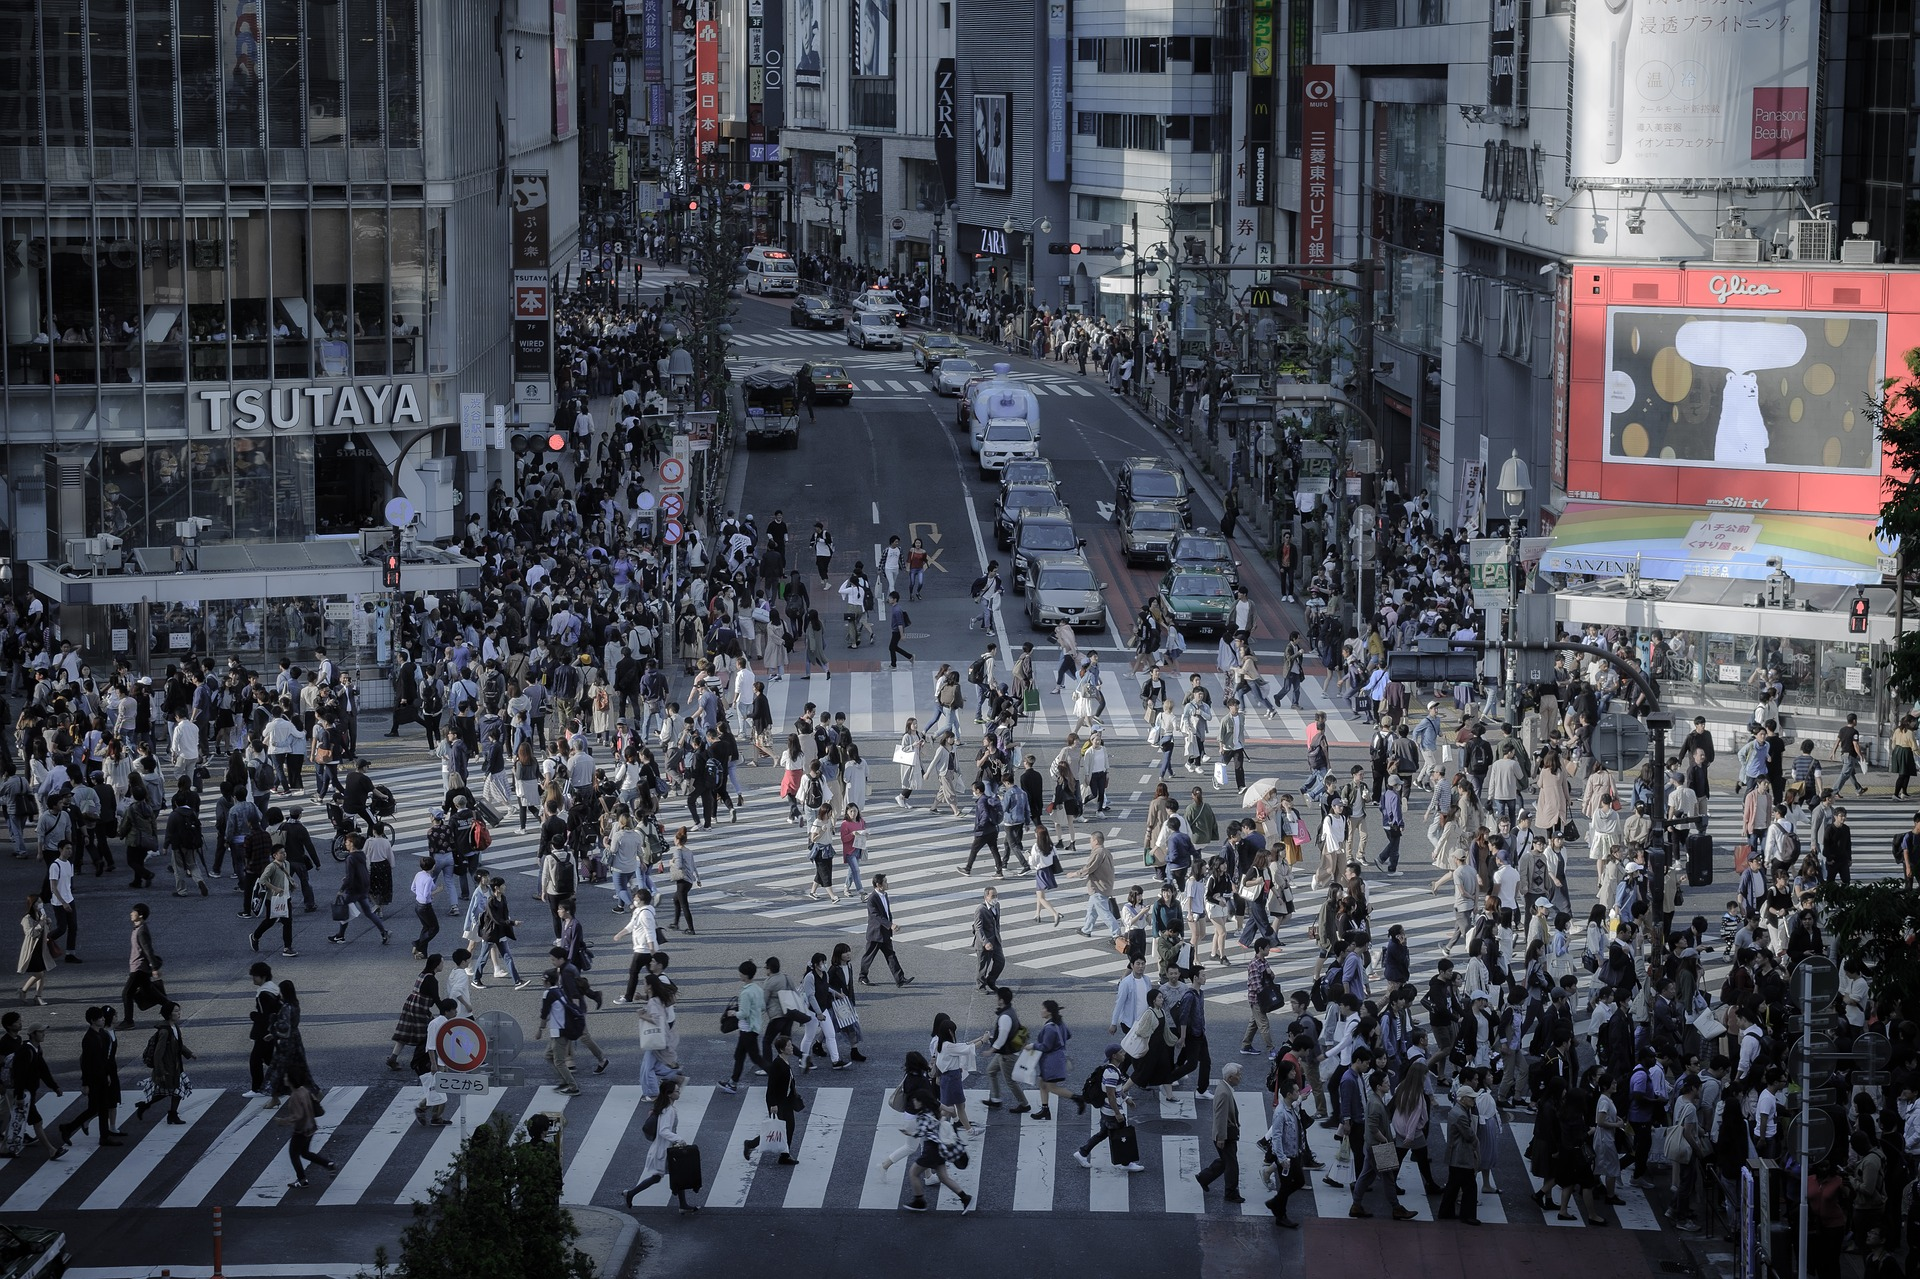 1. Tokyo, Japan -